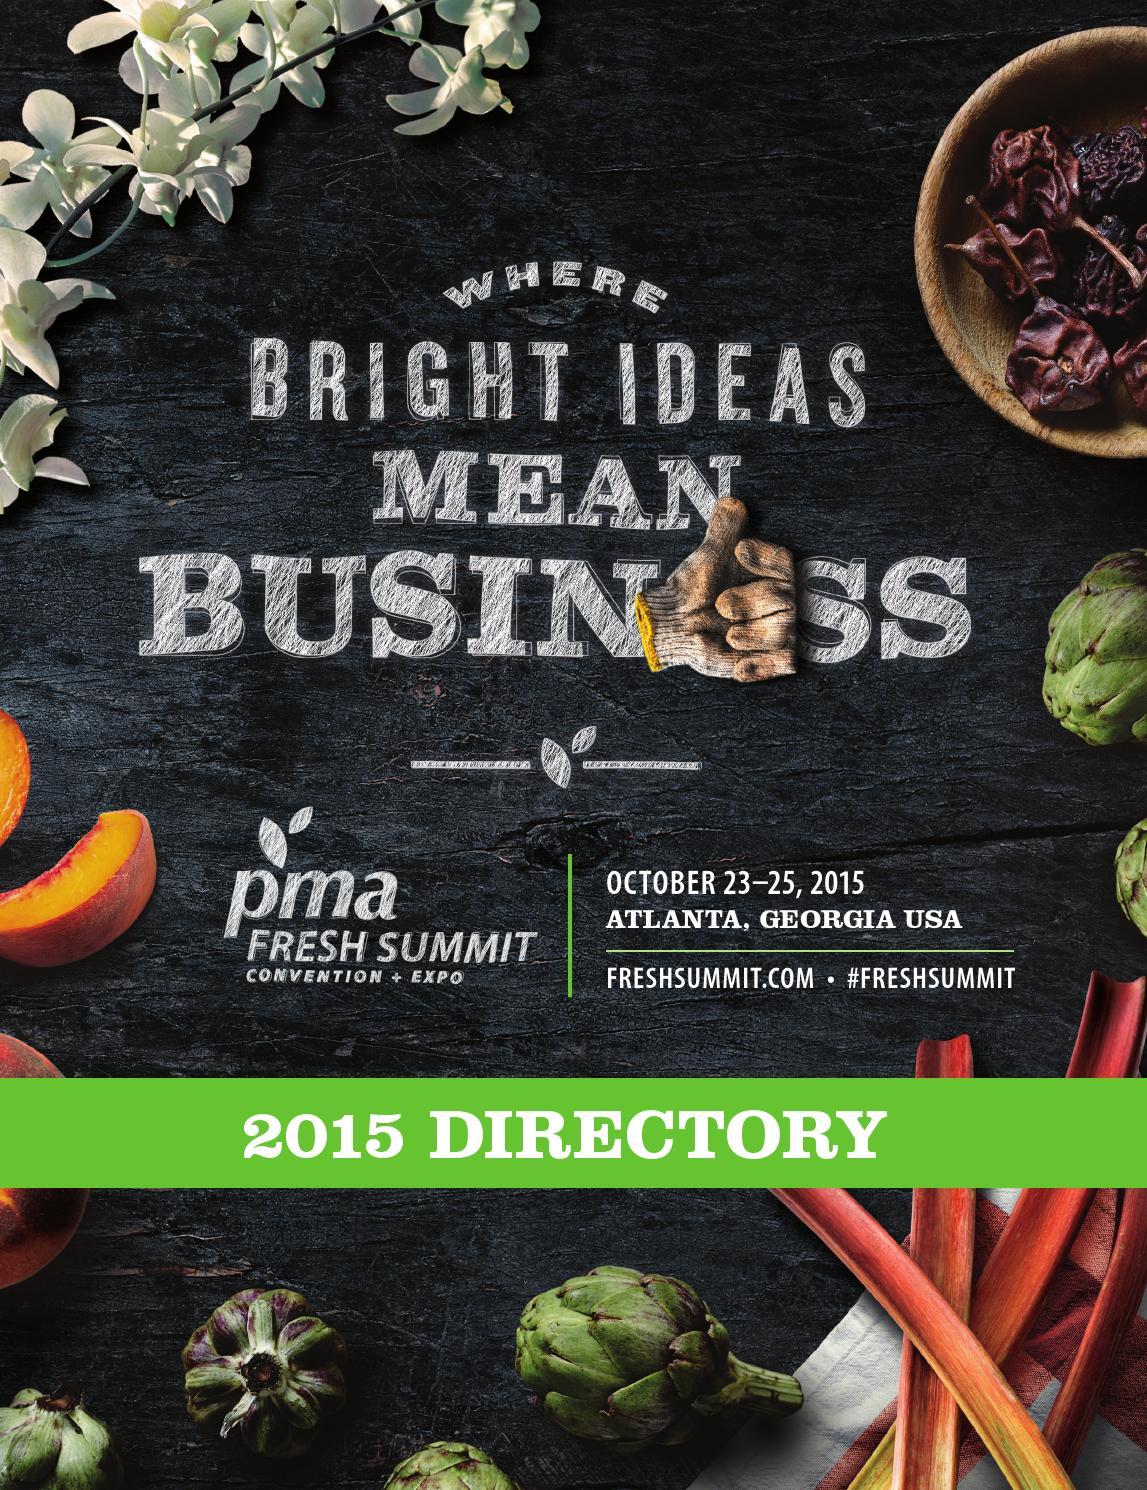 Fresh Summit Directory 2015 By Produce Marketing Association Issuu Vintage Les Paul Wiring Harness